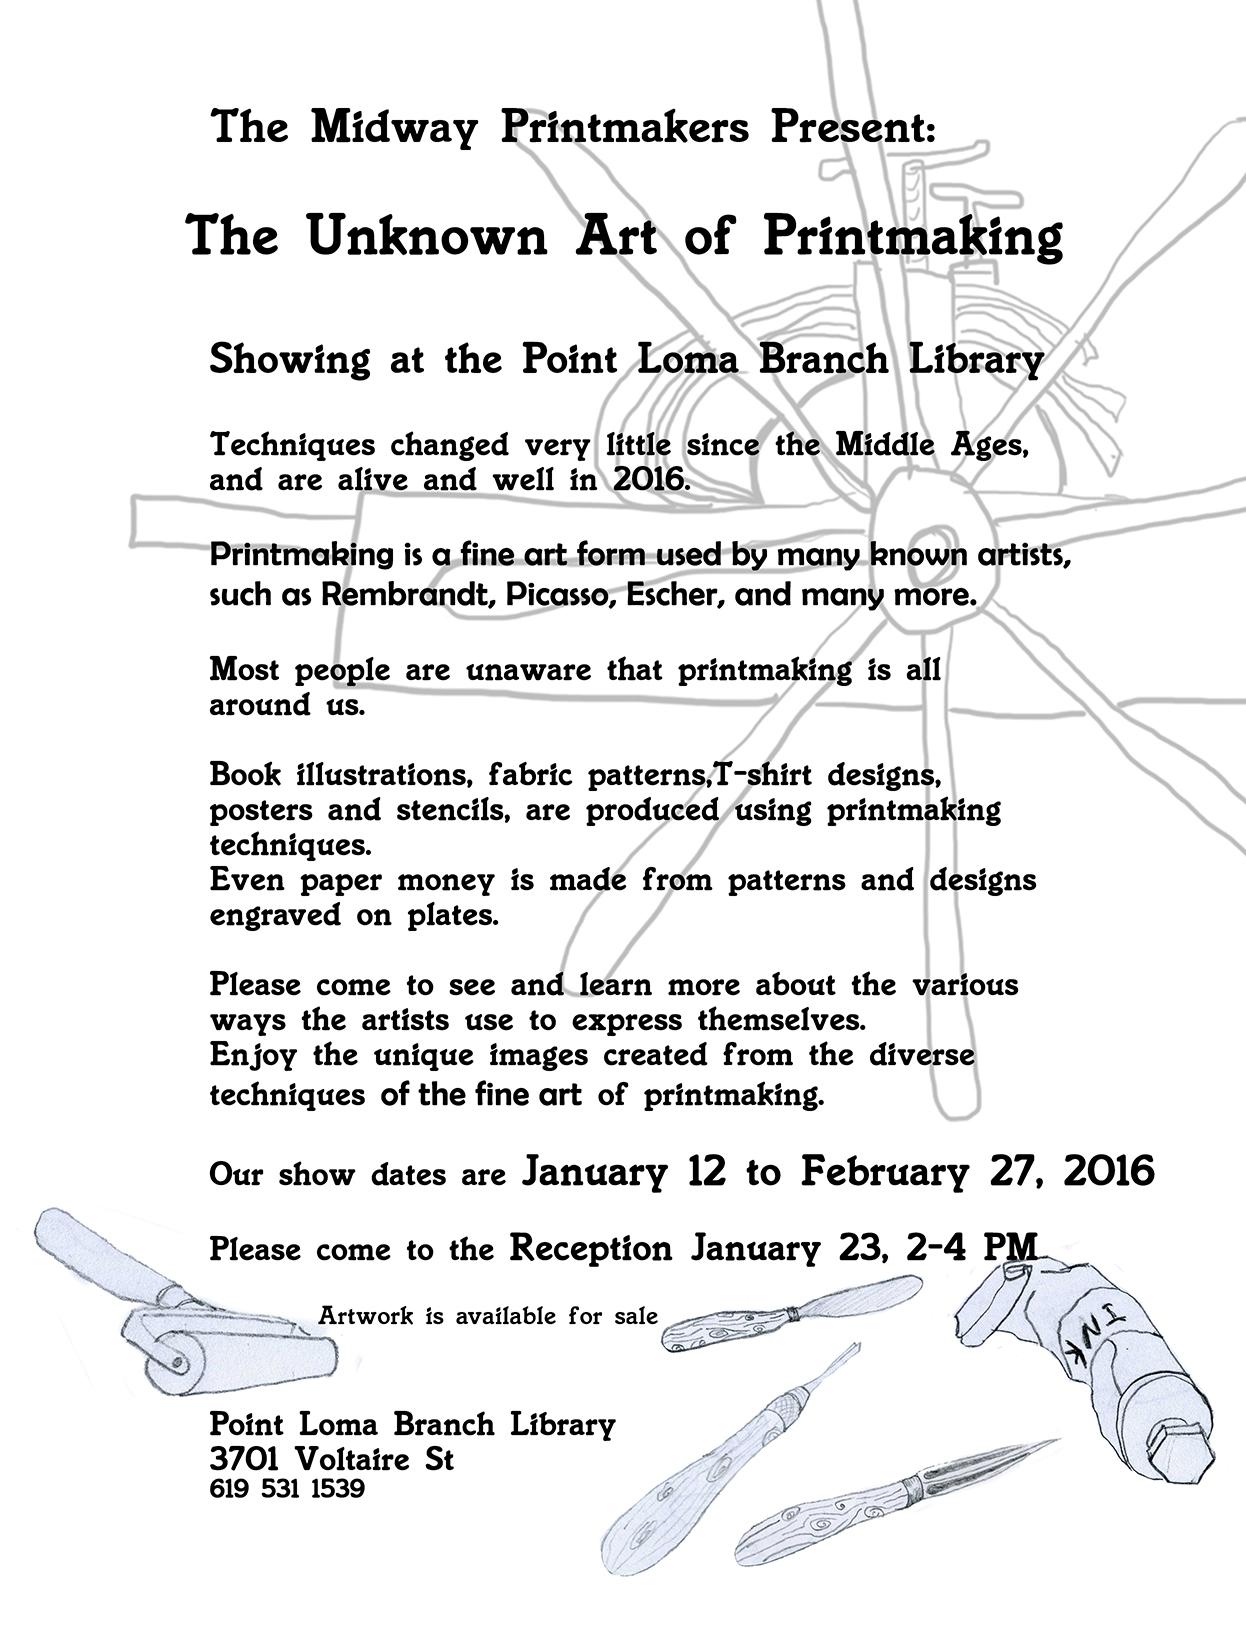 Midway Printmakers Exhibit